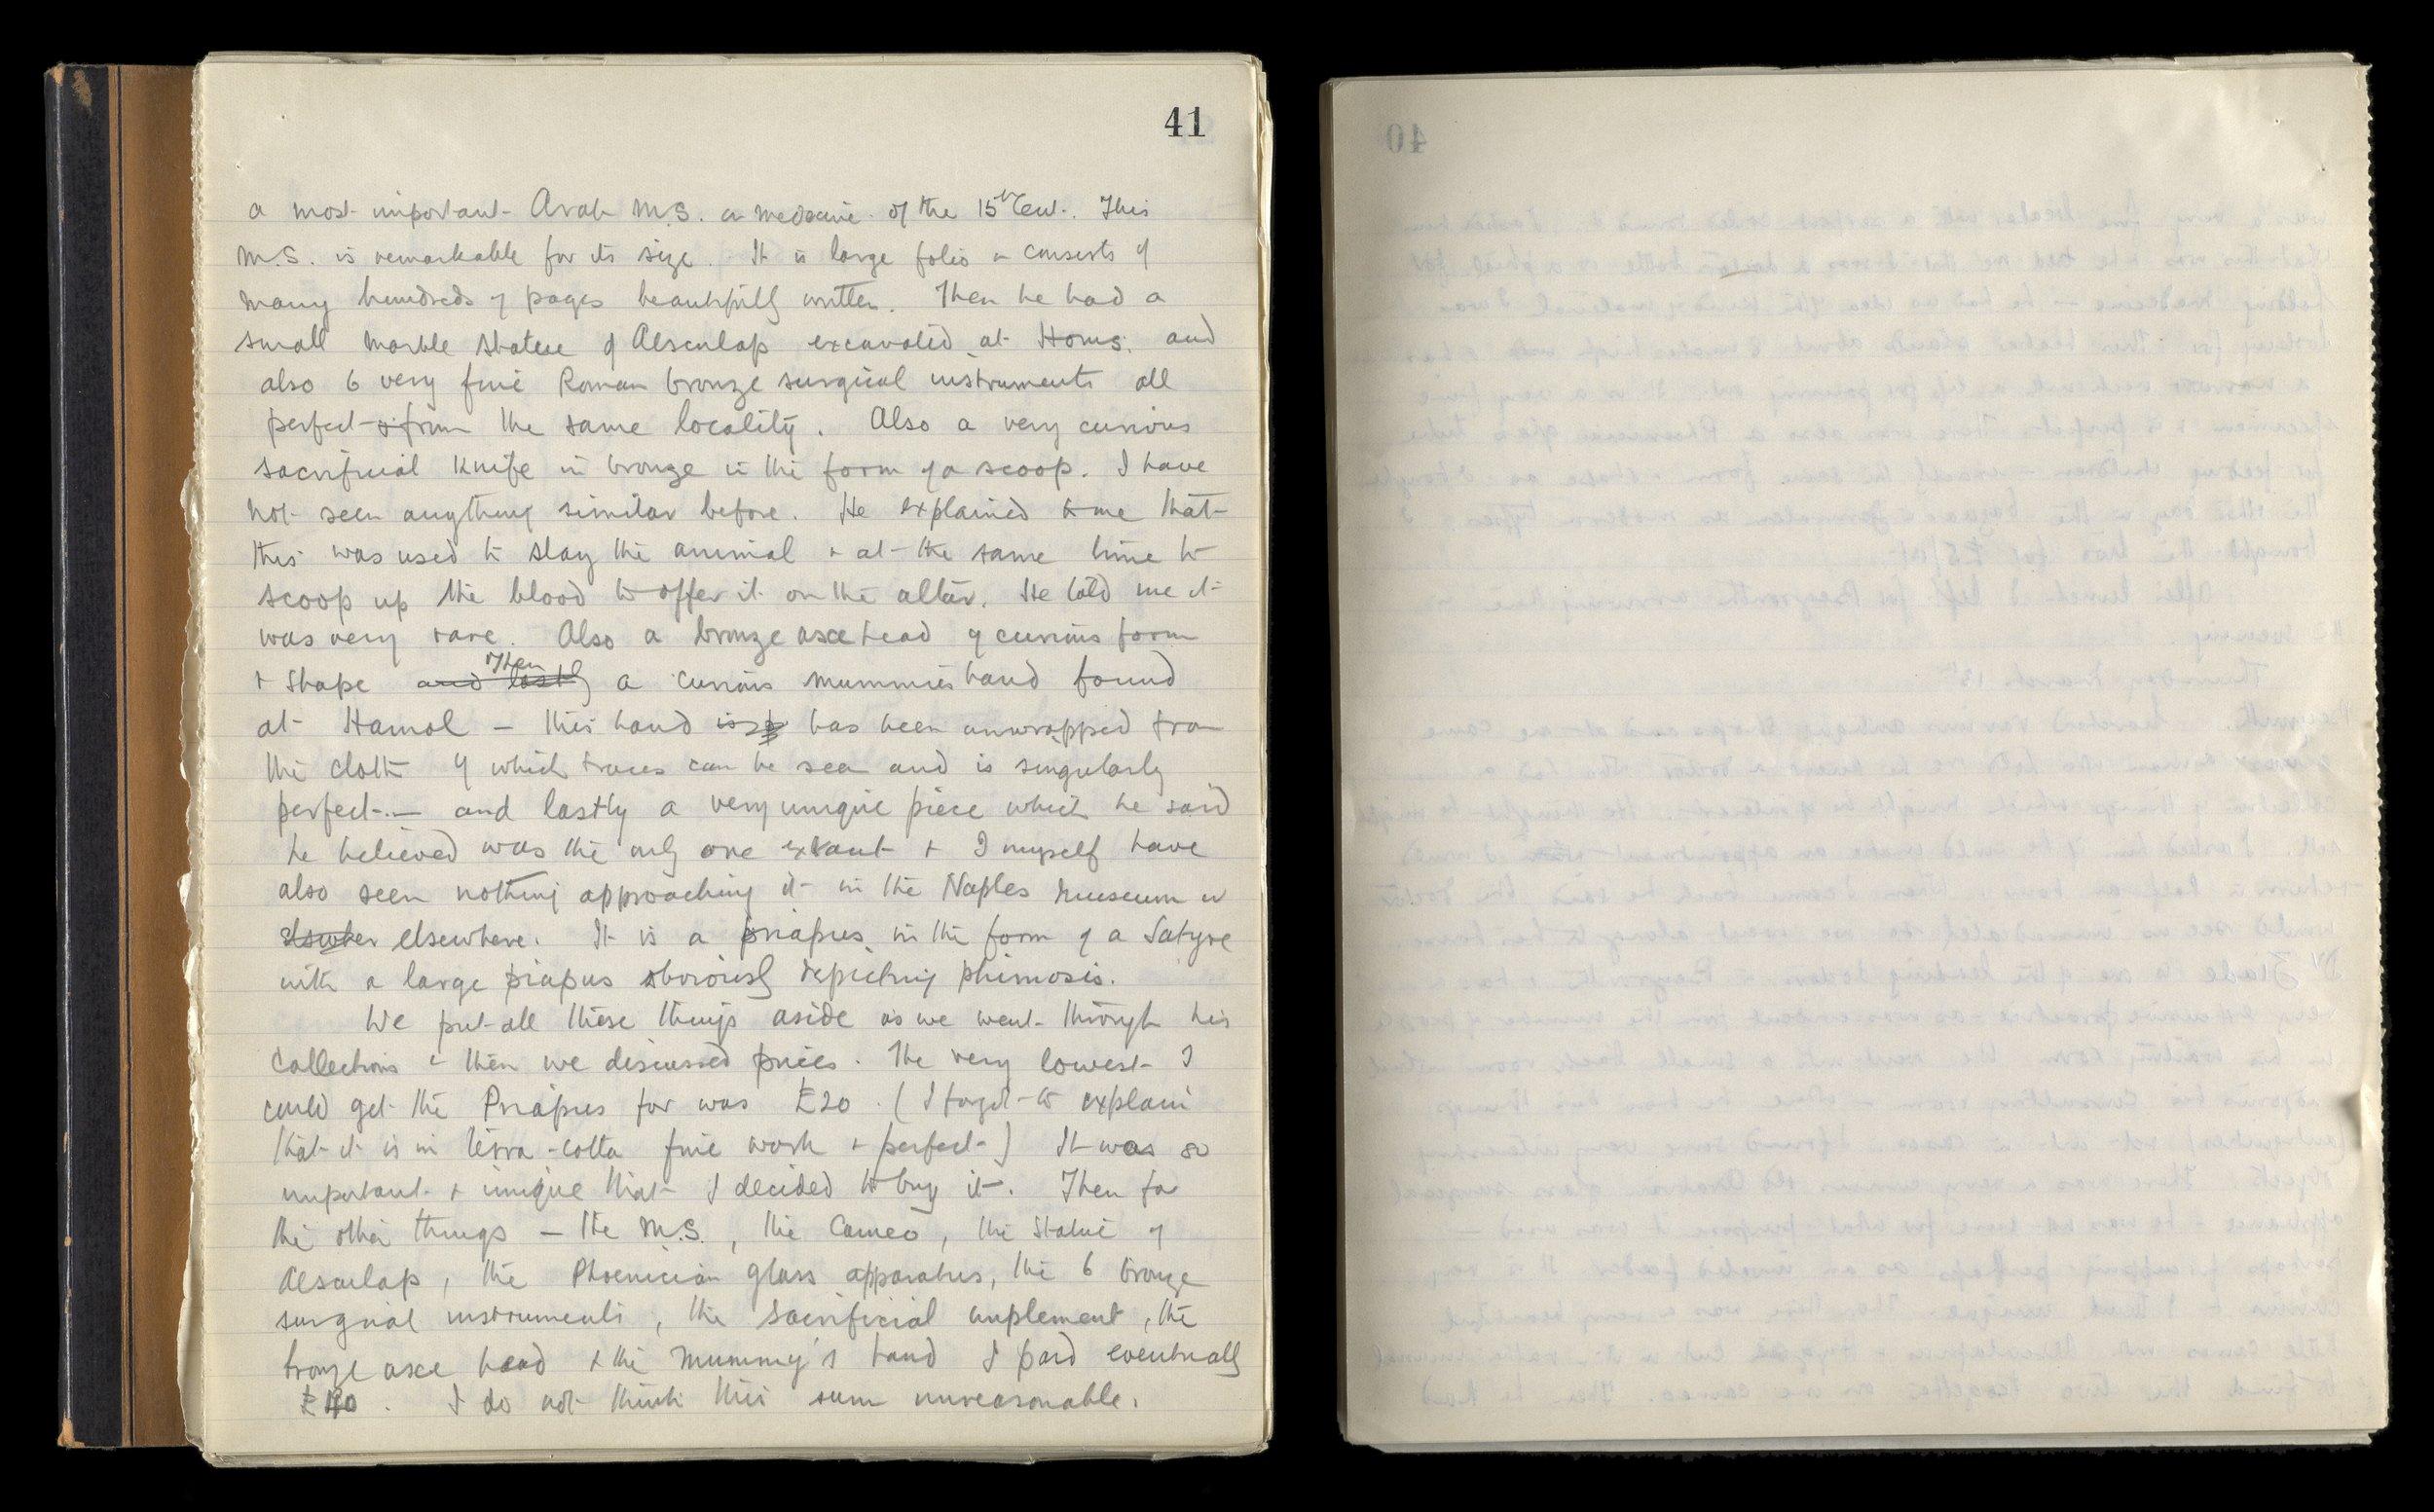 Travel_journal_belonging_to_Peter_Johnston-Saint,_1930_Wellcome_L0075277.jpg